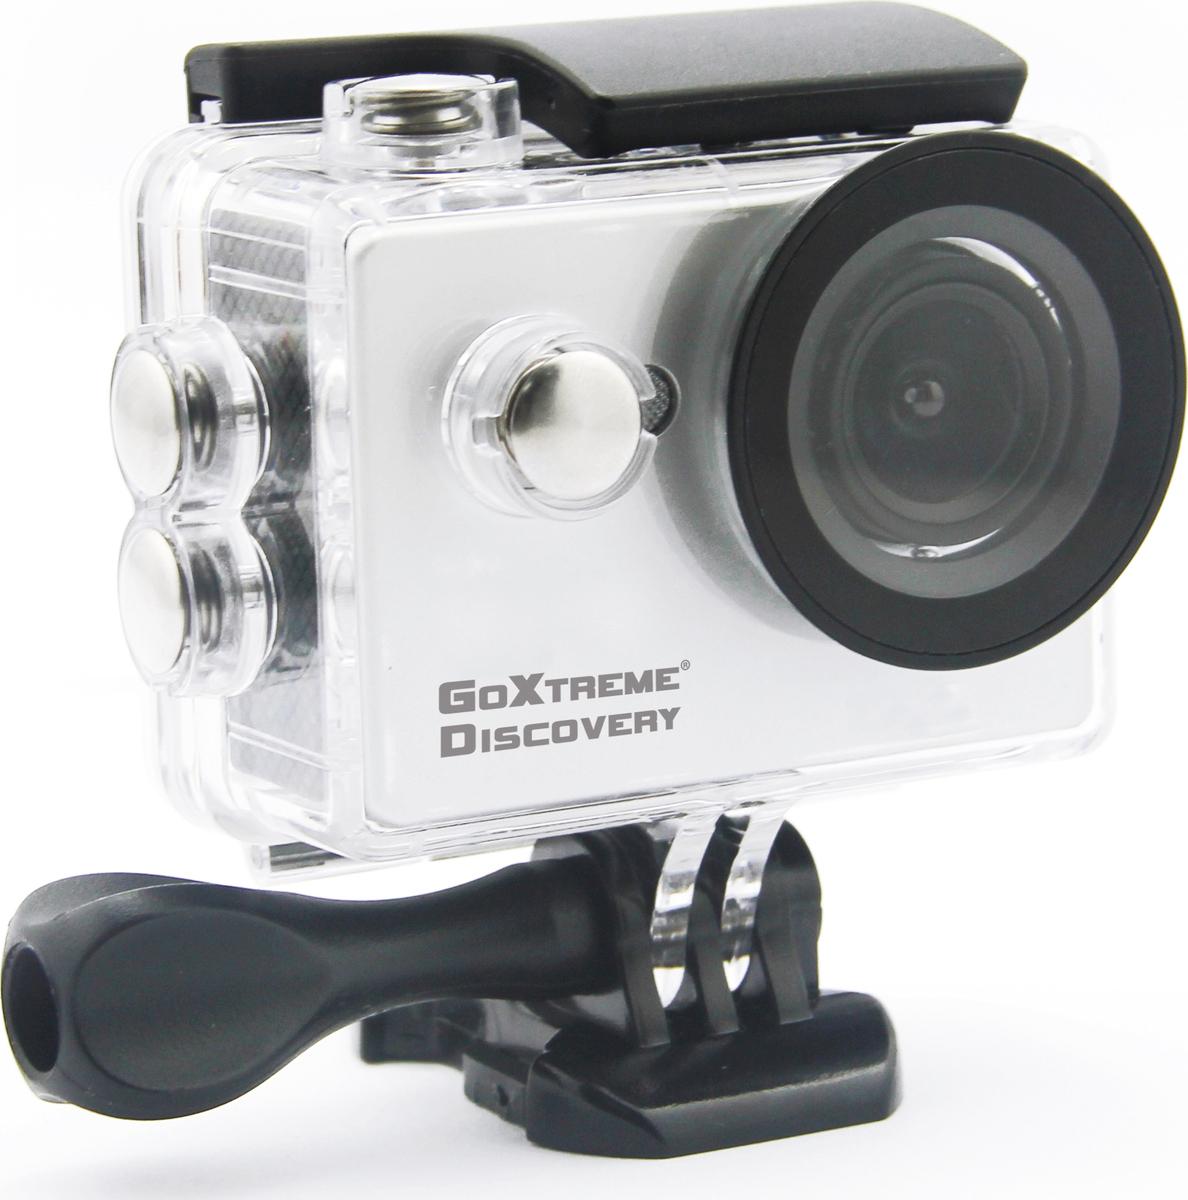 GoXtreme EasyPix Discovery Camera